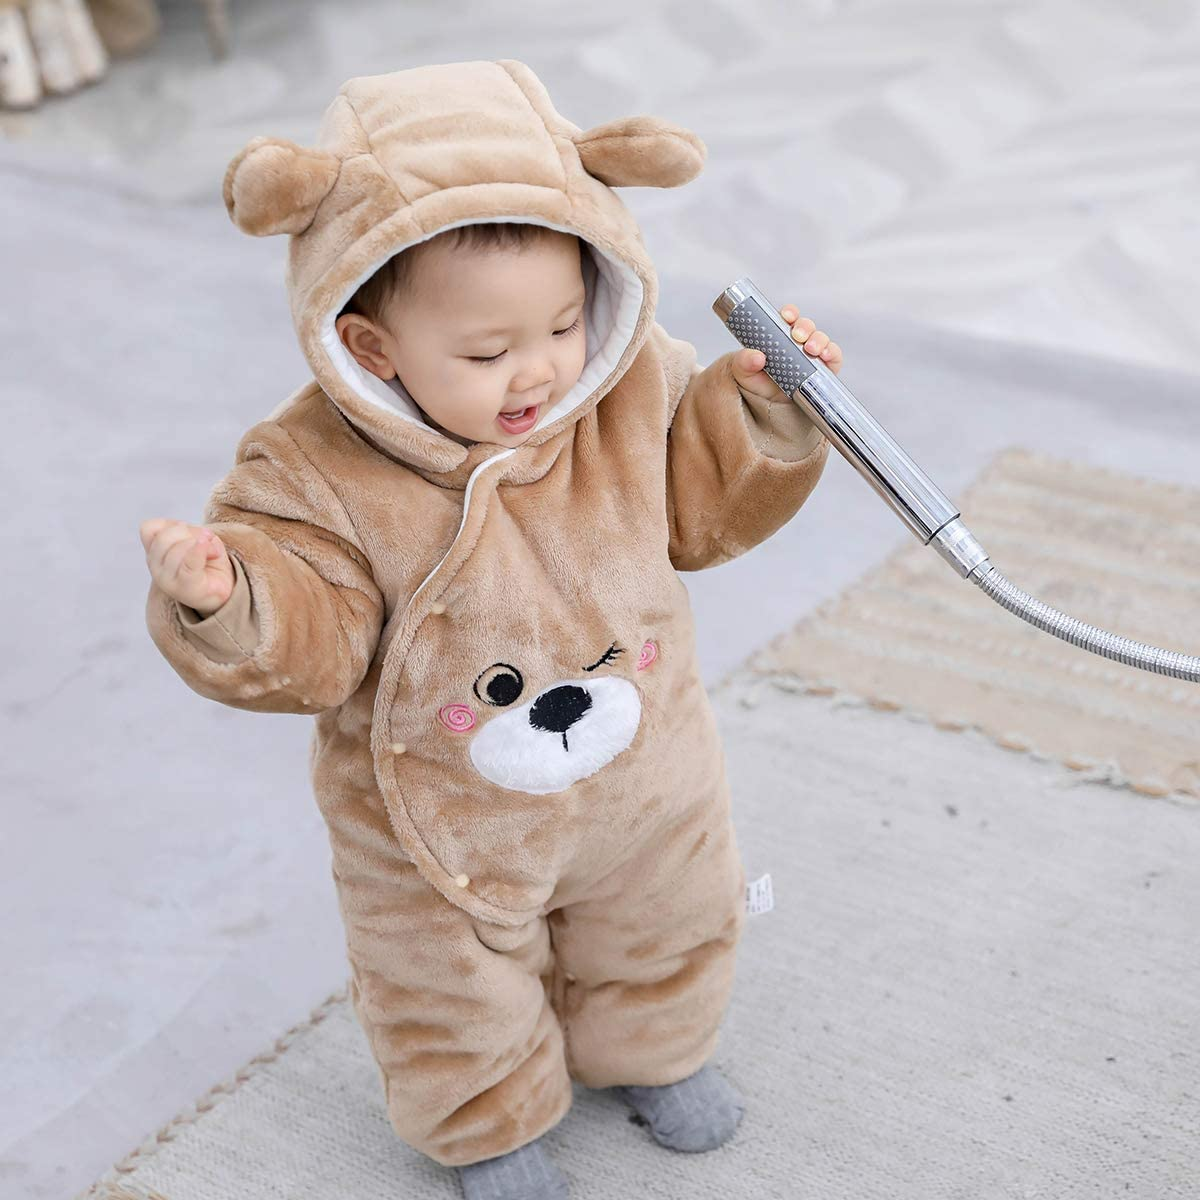 Borlai Newborn Romper Boys Girls Jumpsuit Winter Cartoon Animal Pajamas for 0-12M